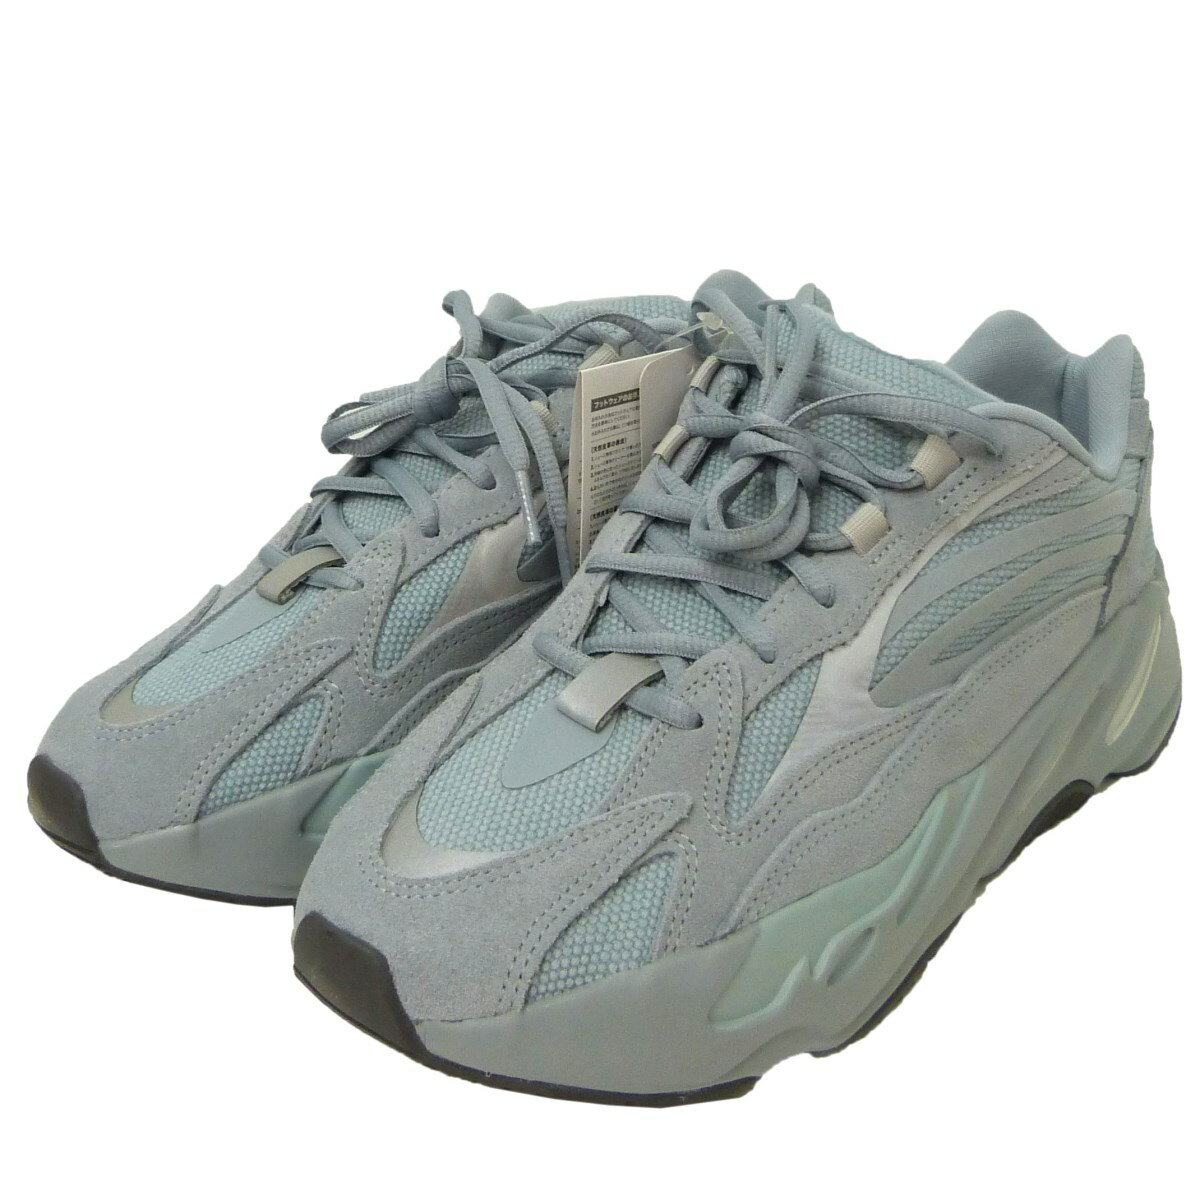 adidas Originals Yeezy Boost 700 V2